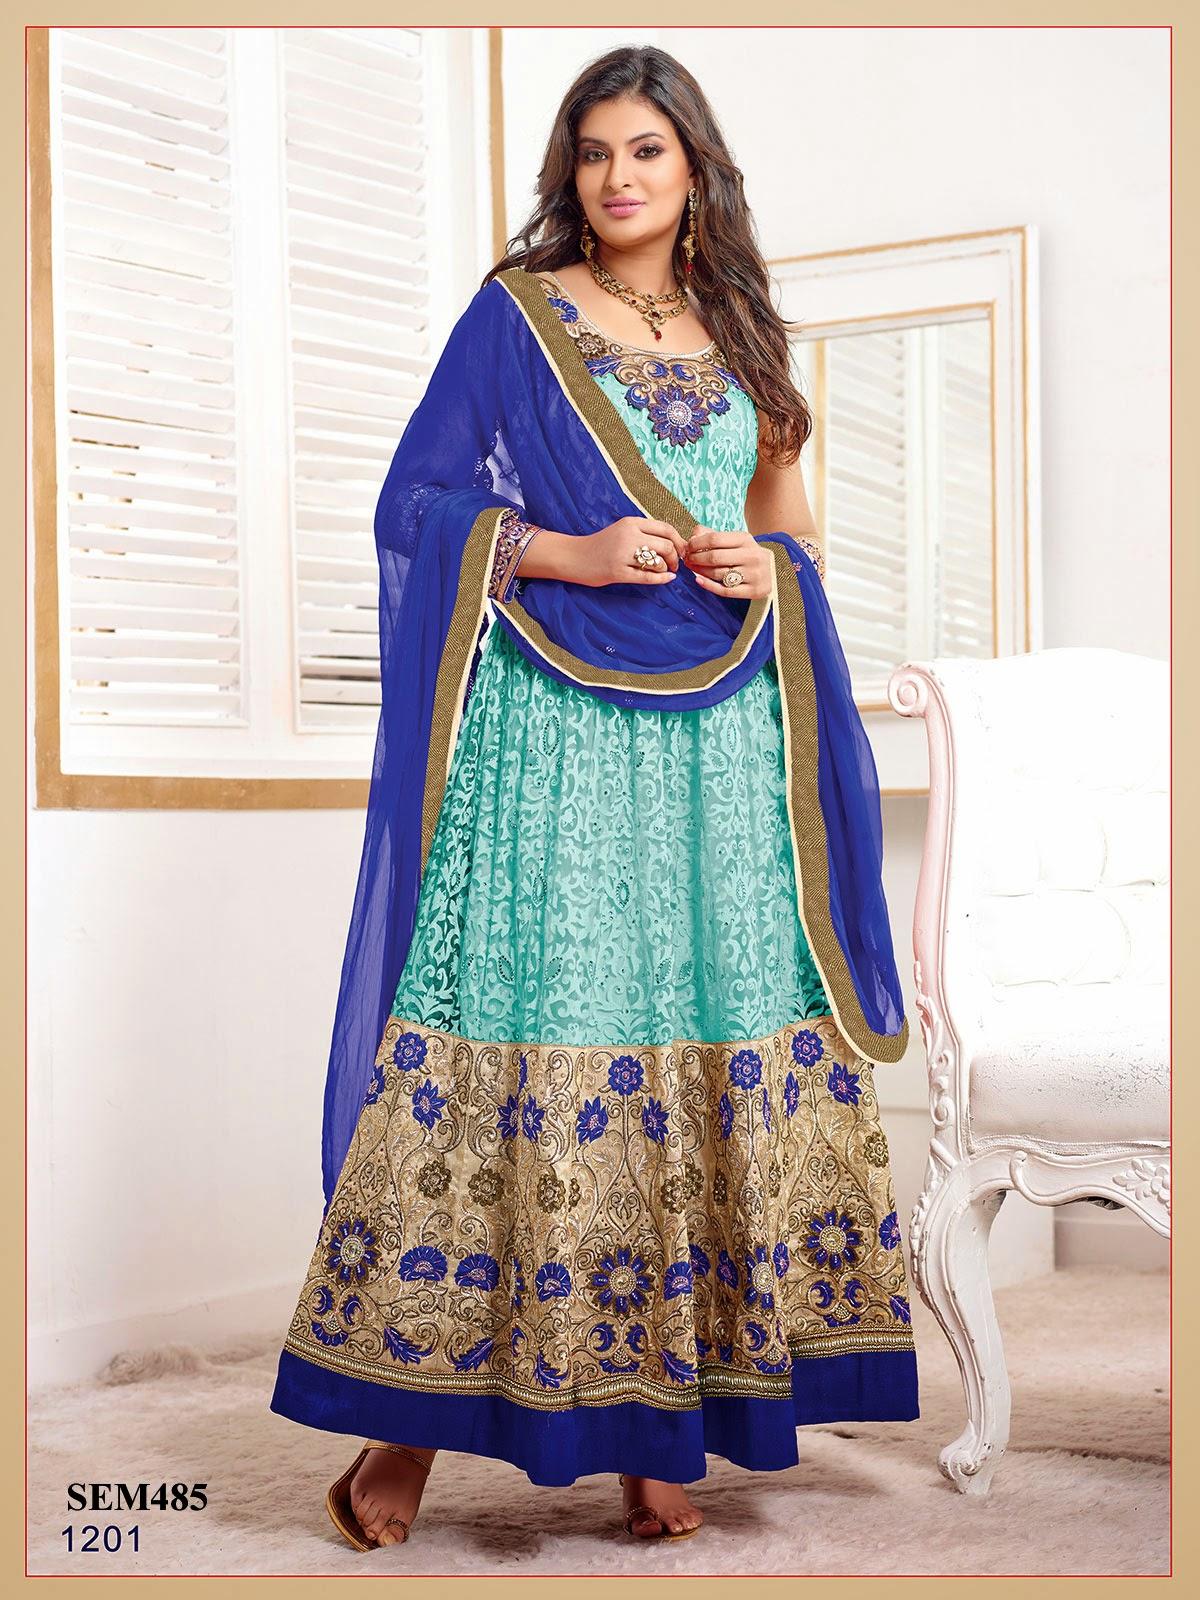 Sayali Bhagat In Designer Net Long Anarkali Suit   Helix Enterprise